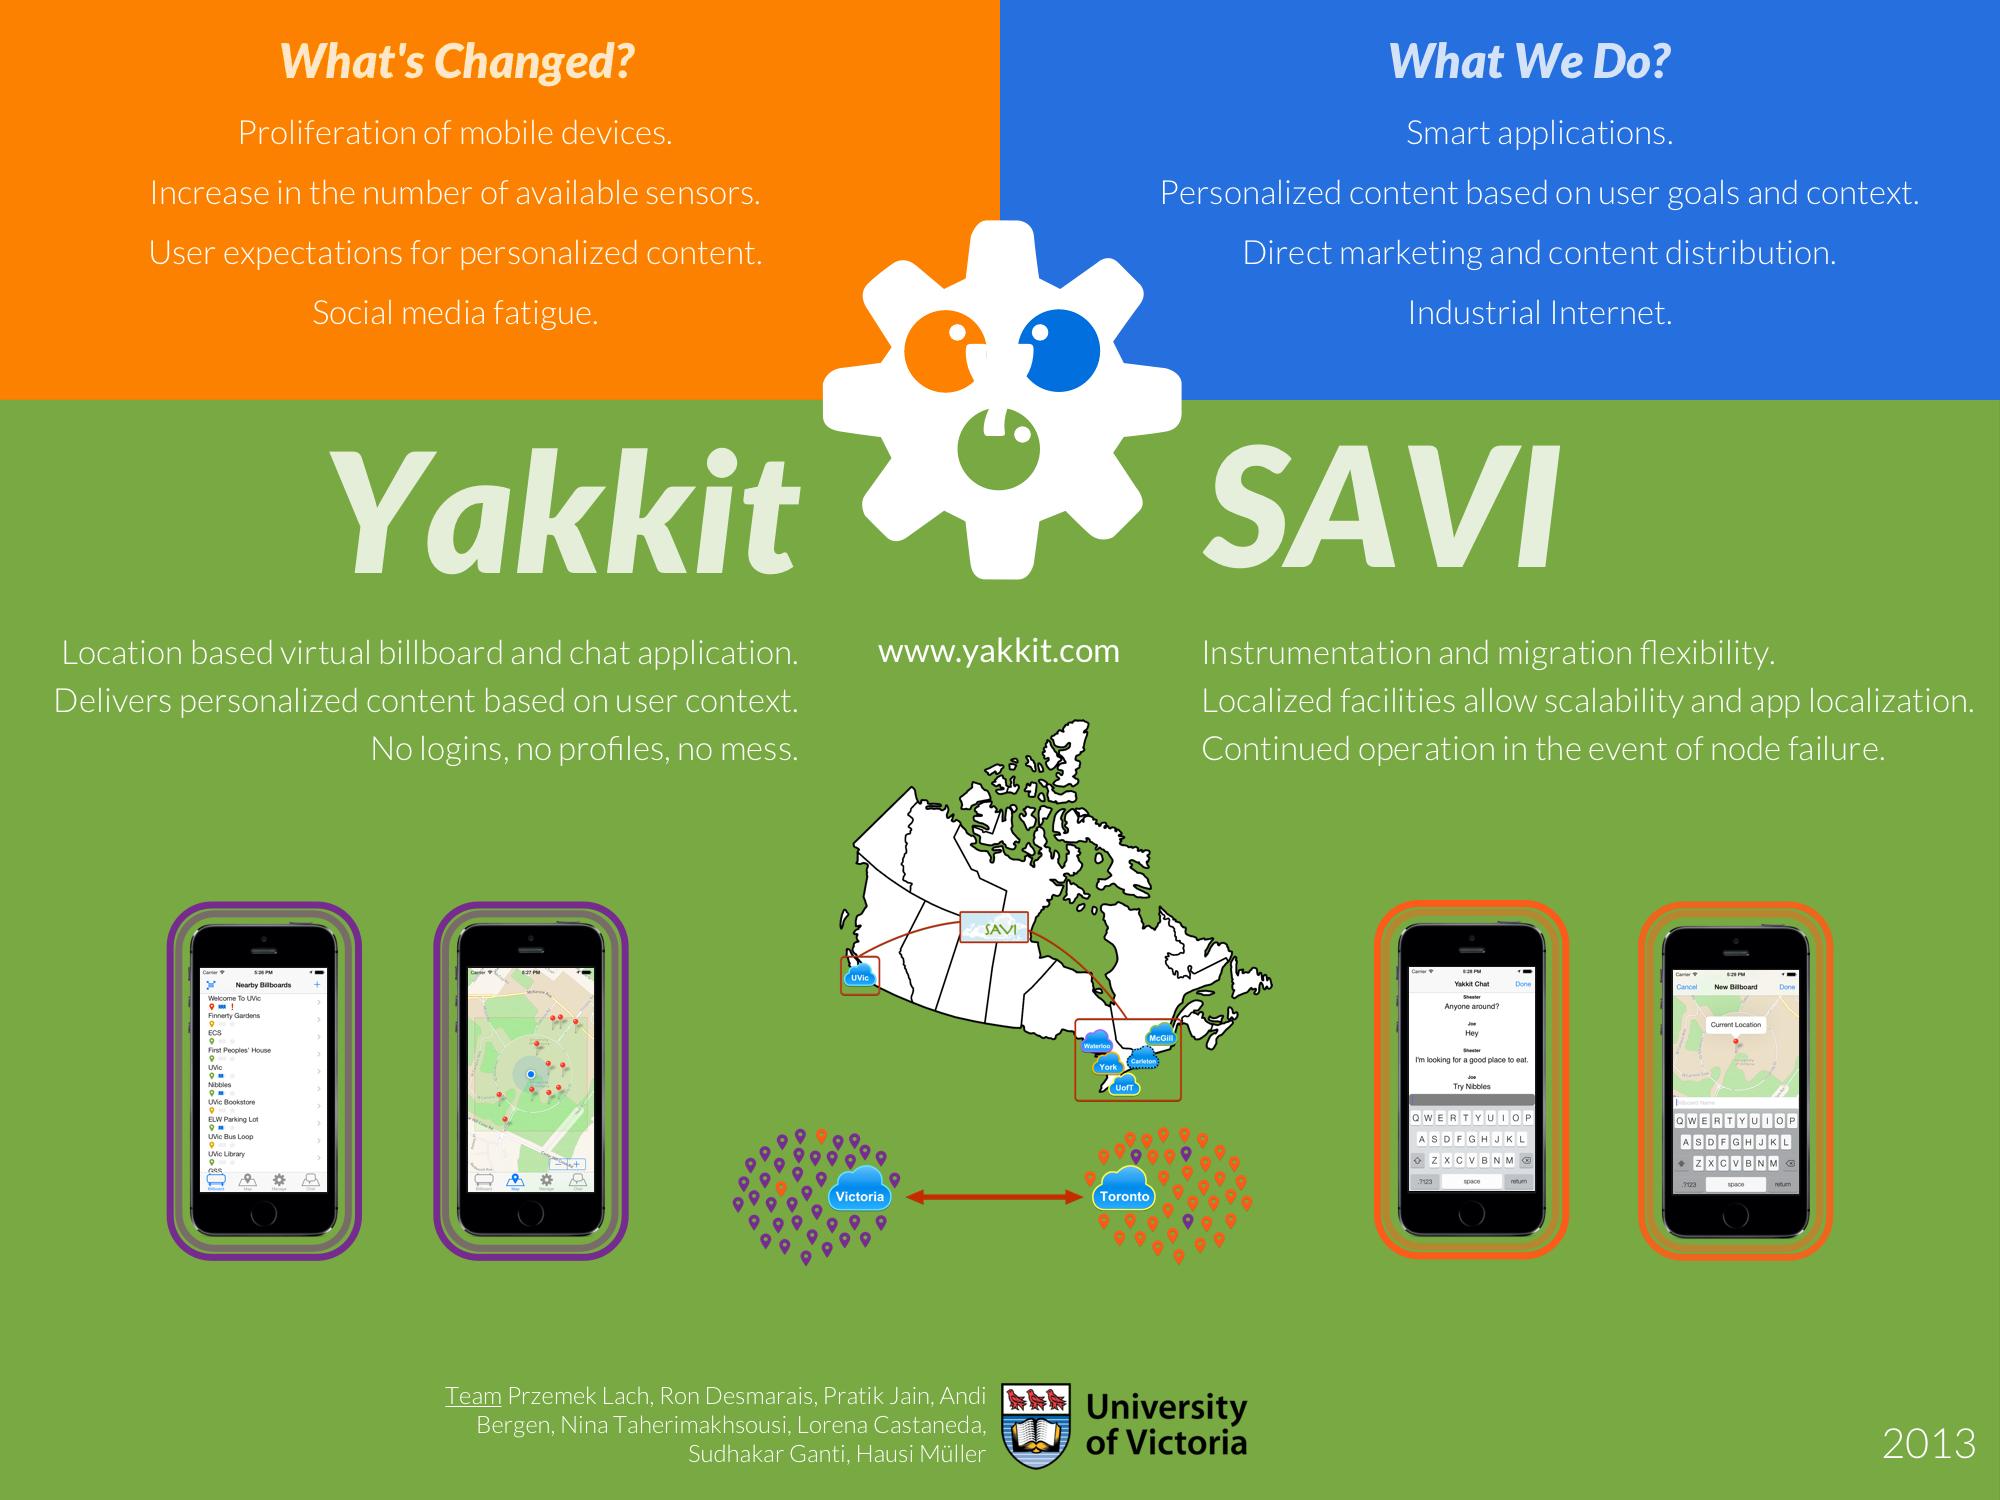 https://sites.google.com/a/rigiresearch.com/rigi-research/research/yakkit-location-based-messaging/Yakkit%20CASCON%20Poster.png